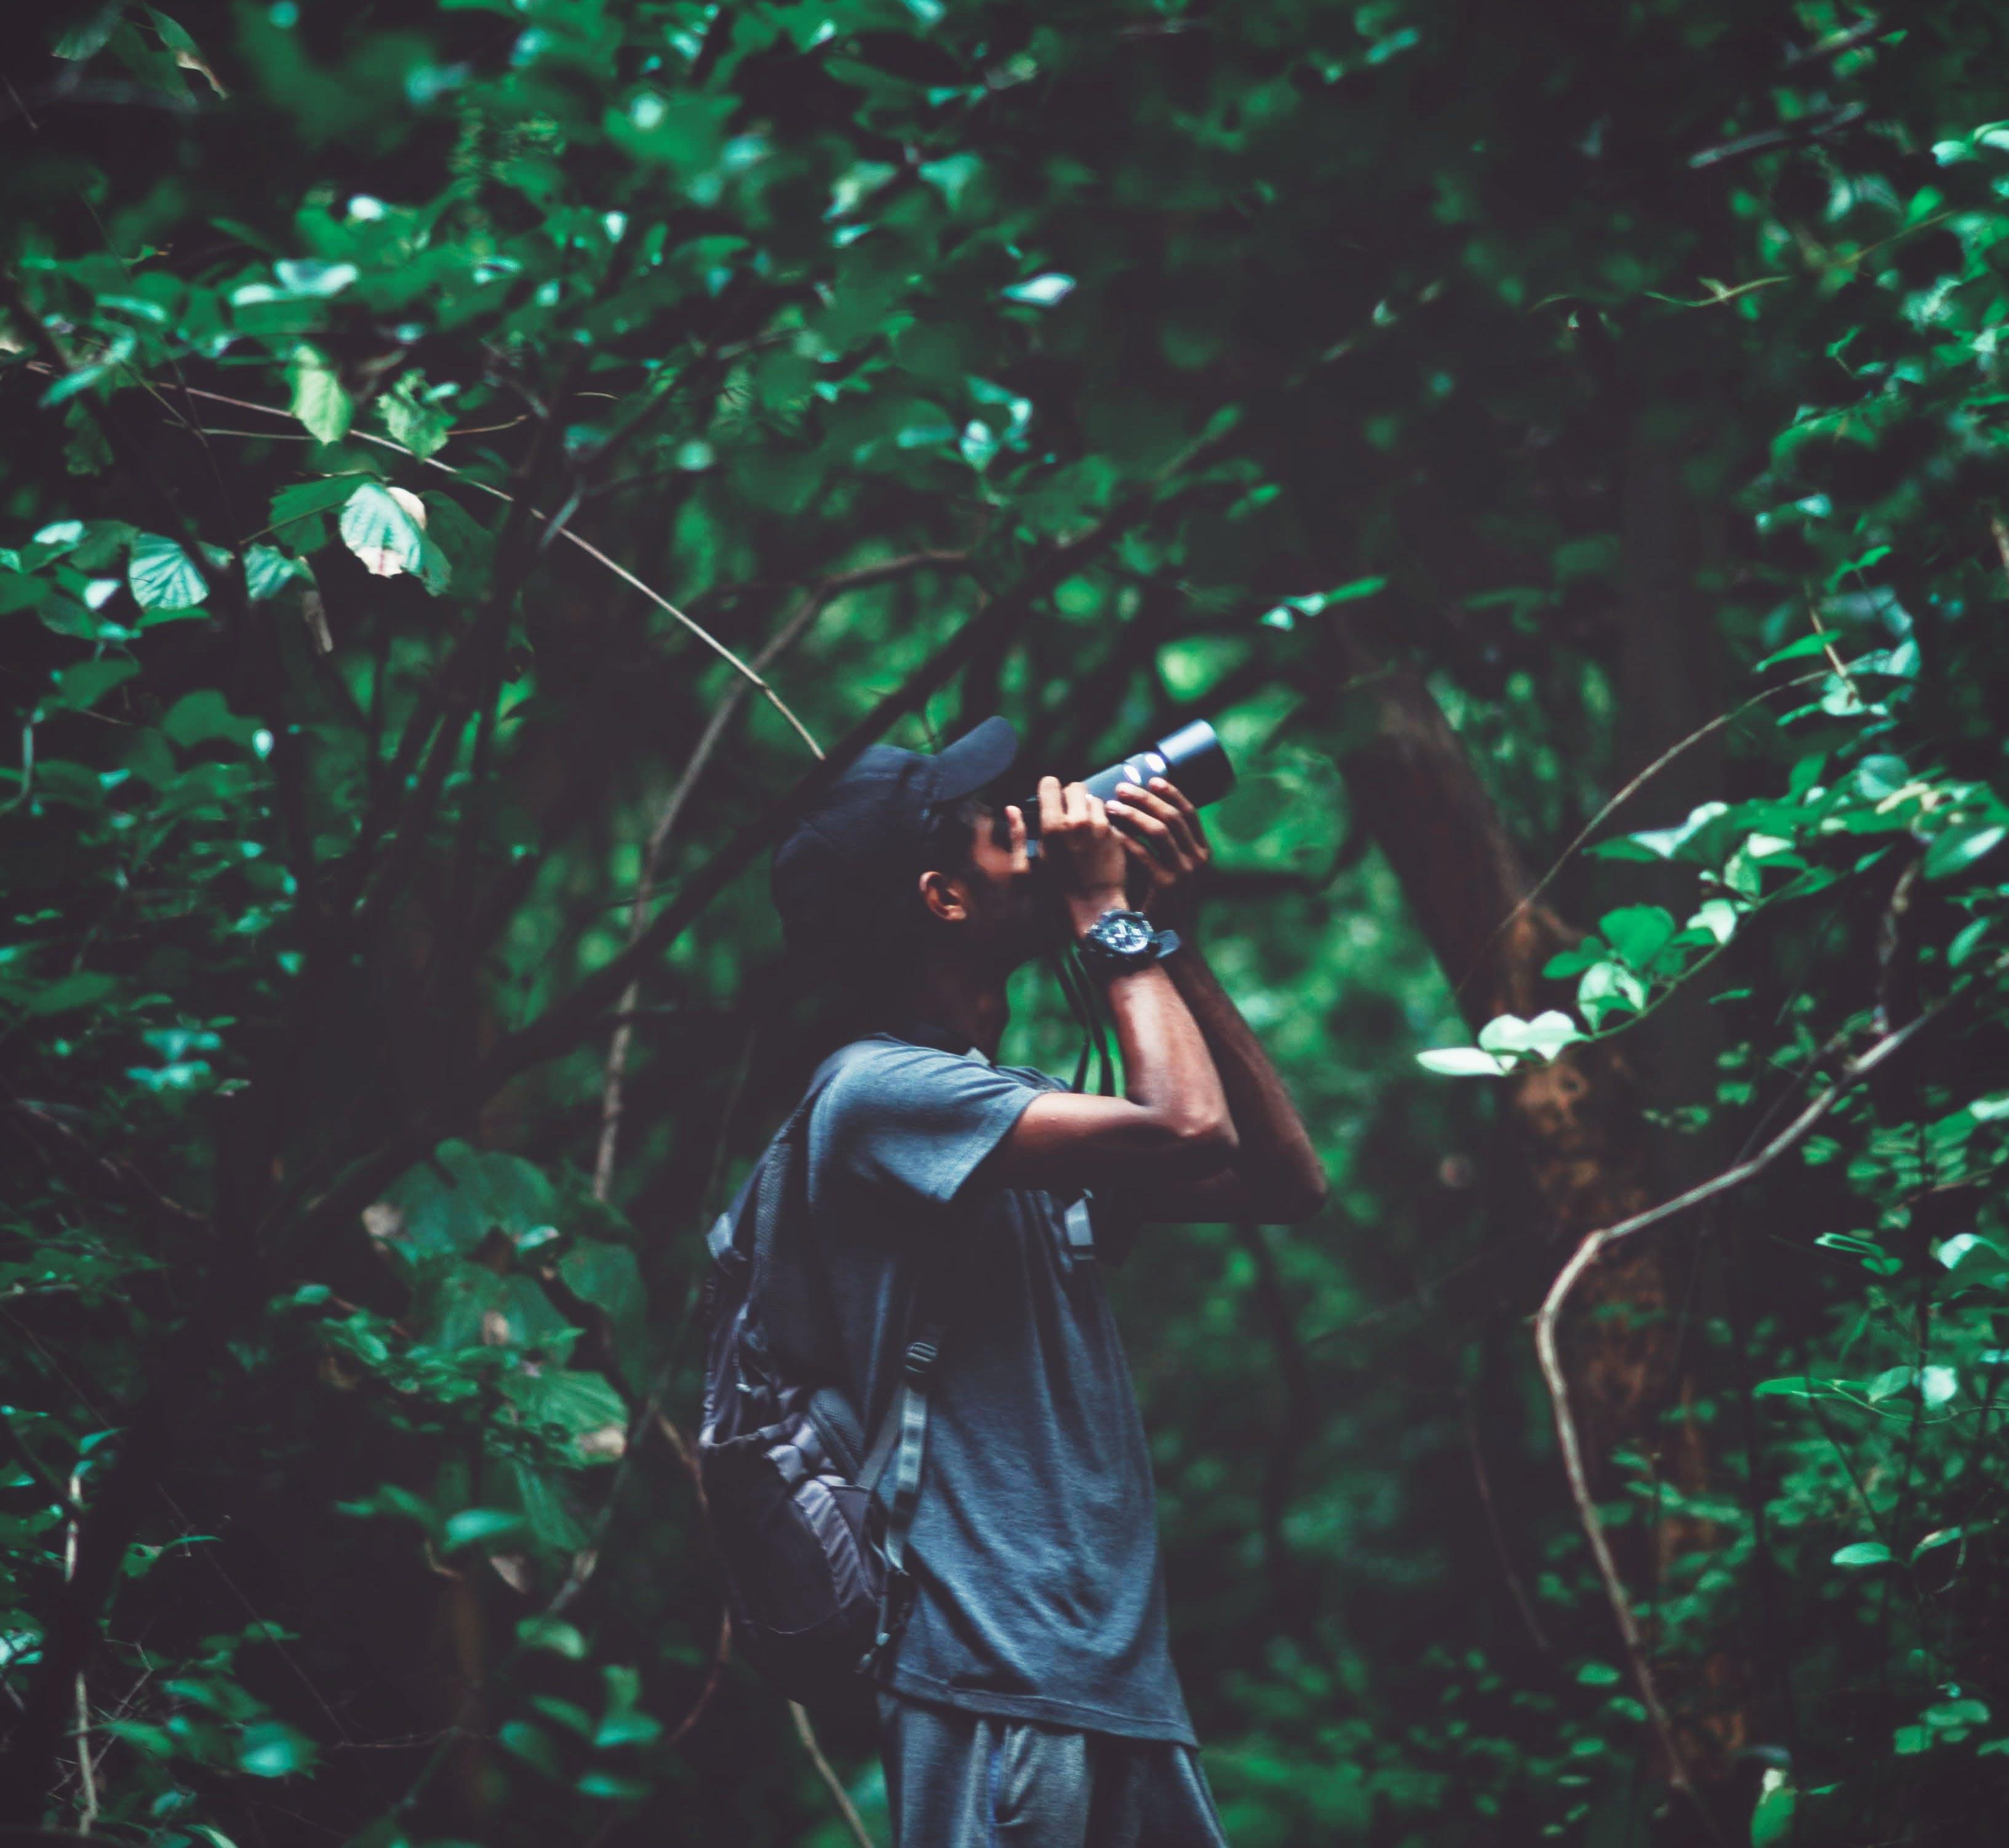 Man Standing Near Tree Taking Photo